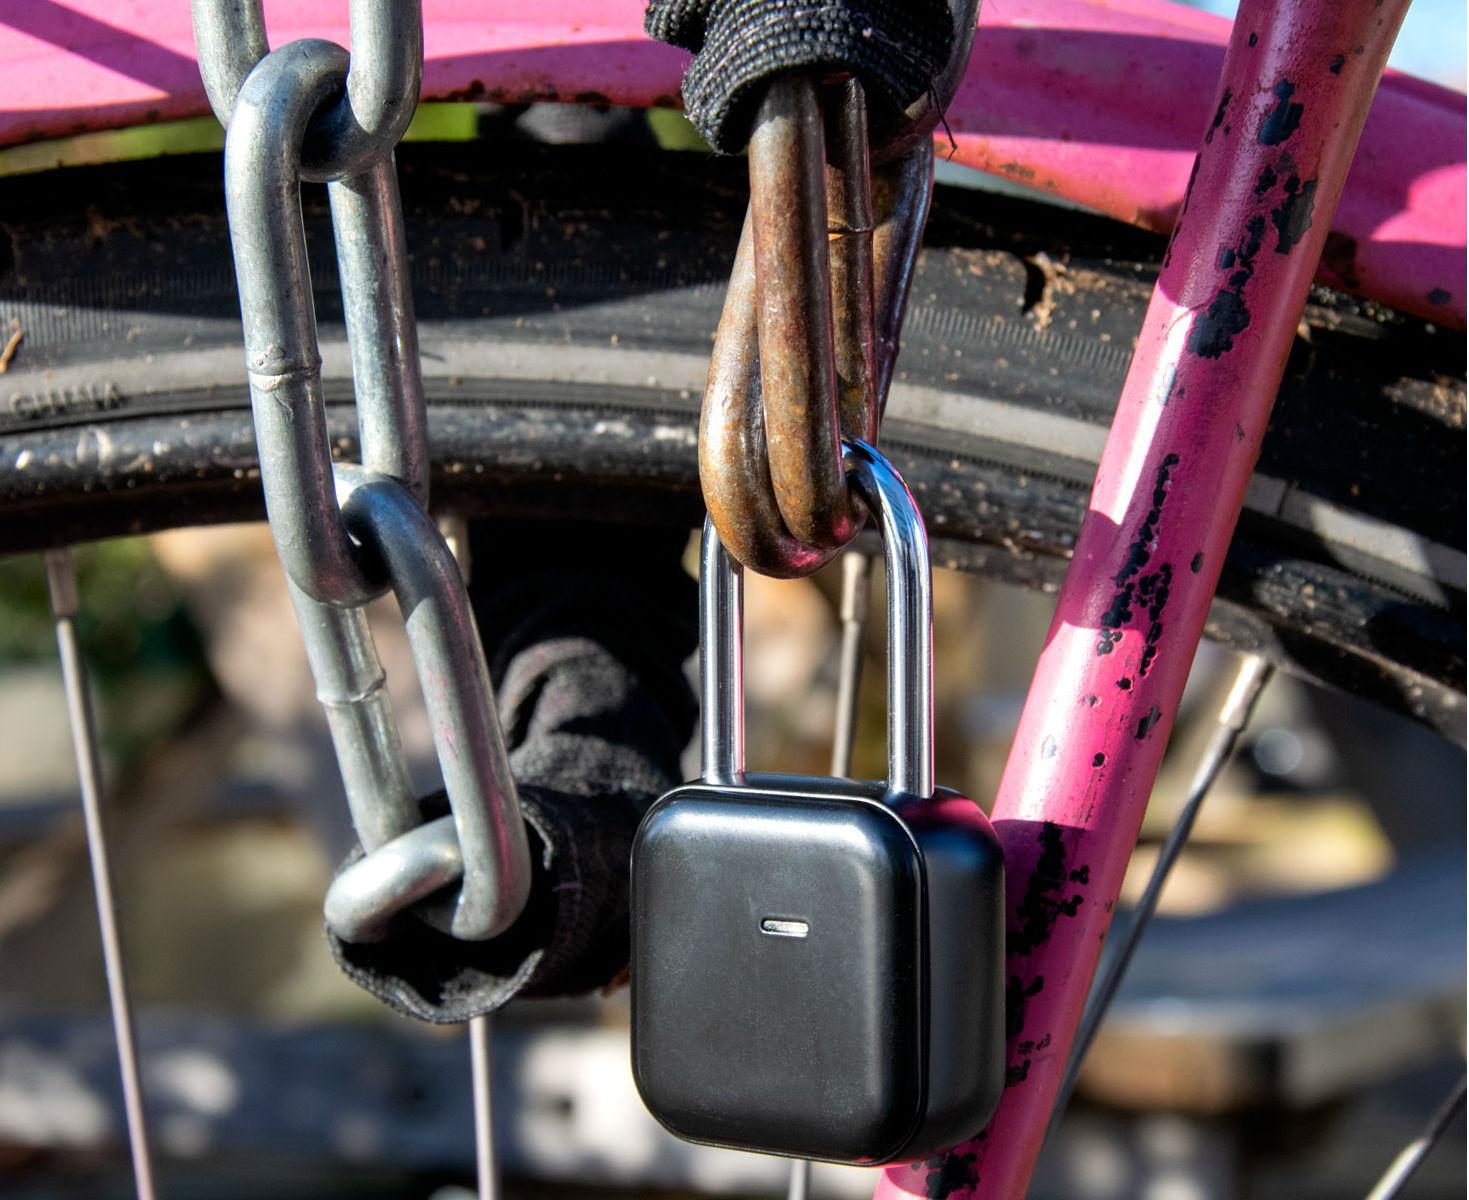 Koop Bluetooth hanbgslot nu online bij Silvergear